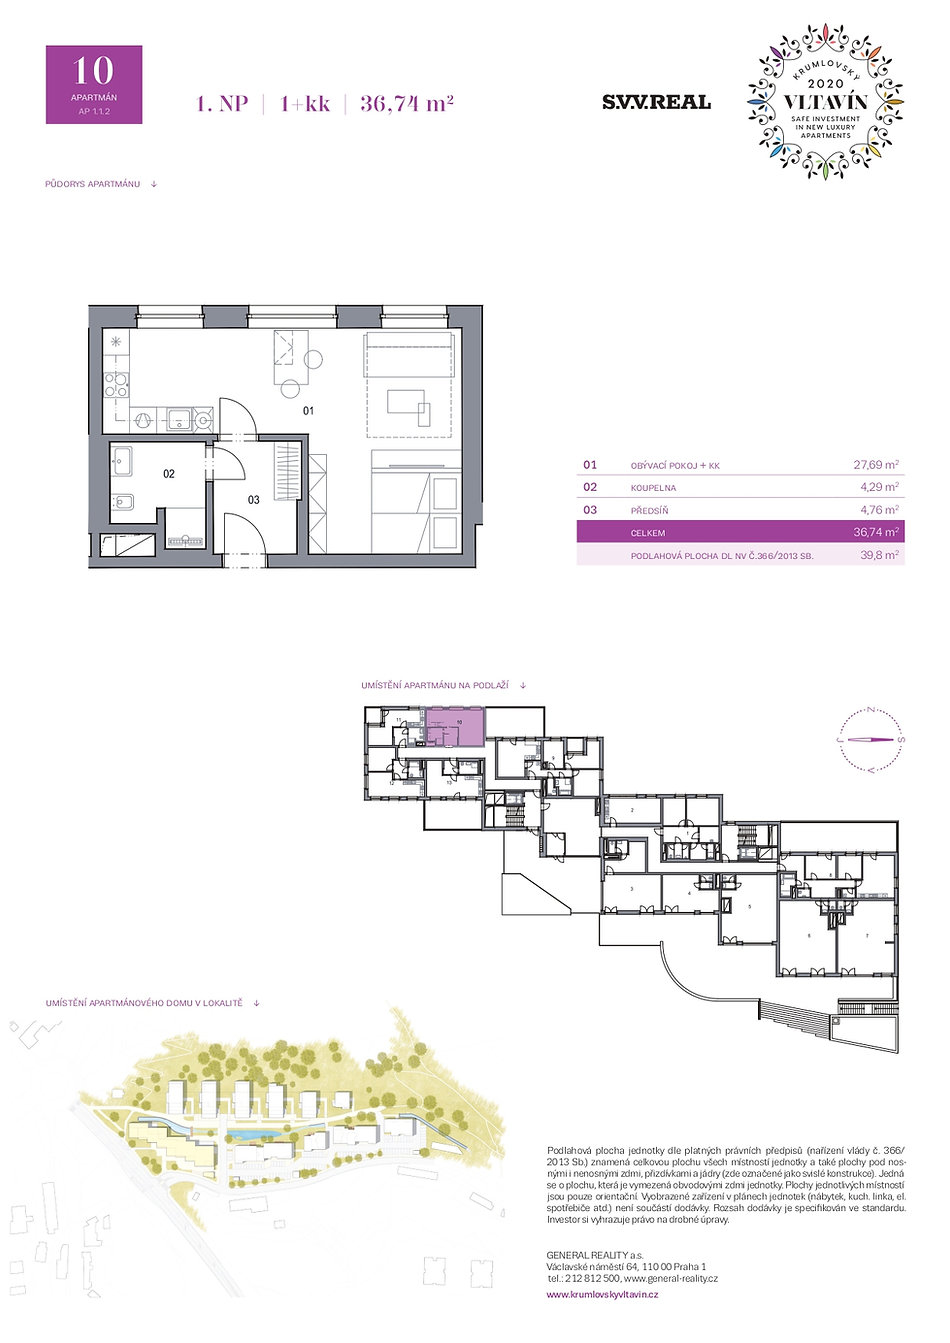 GR_krumlovsky-vltavin_bytove-karty-apartmany_1NP_A10_page-0001.jpg